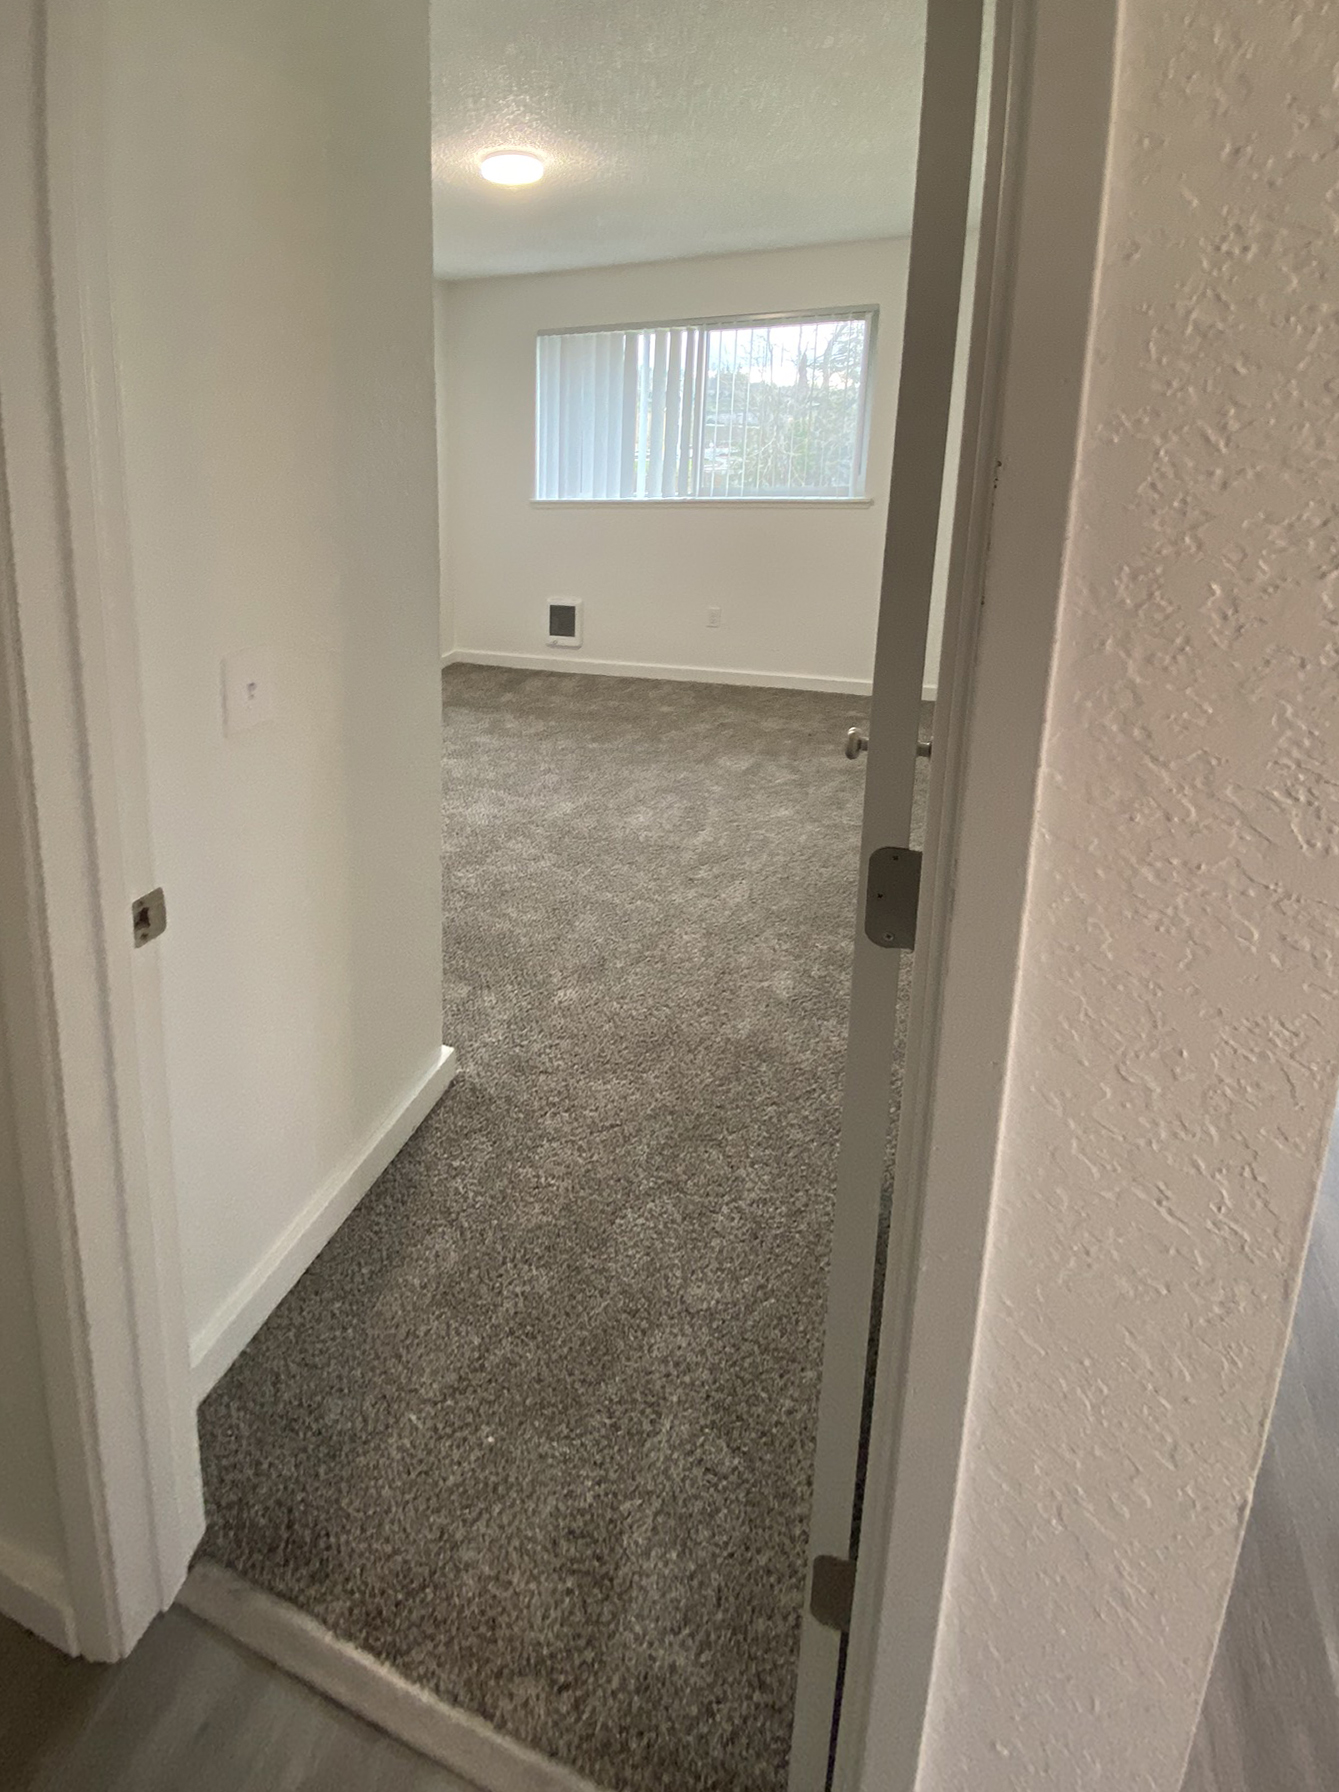 2020 Second Bedroom Remodel